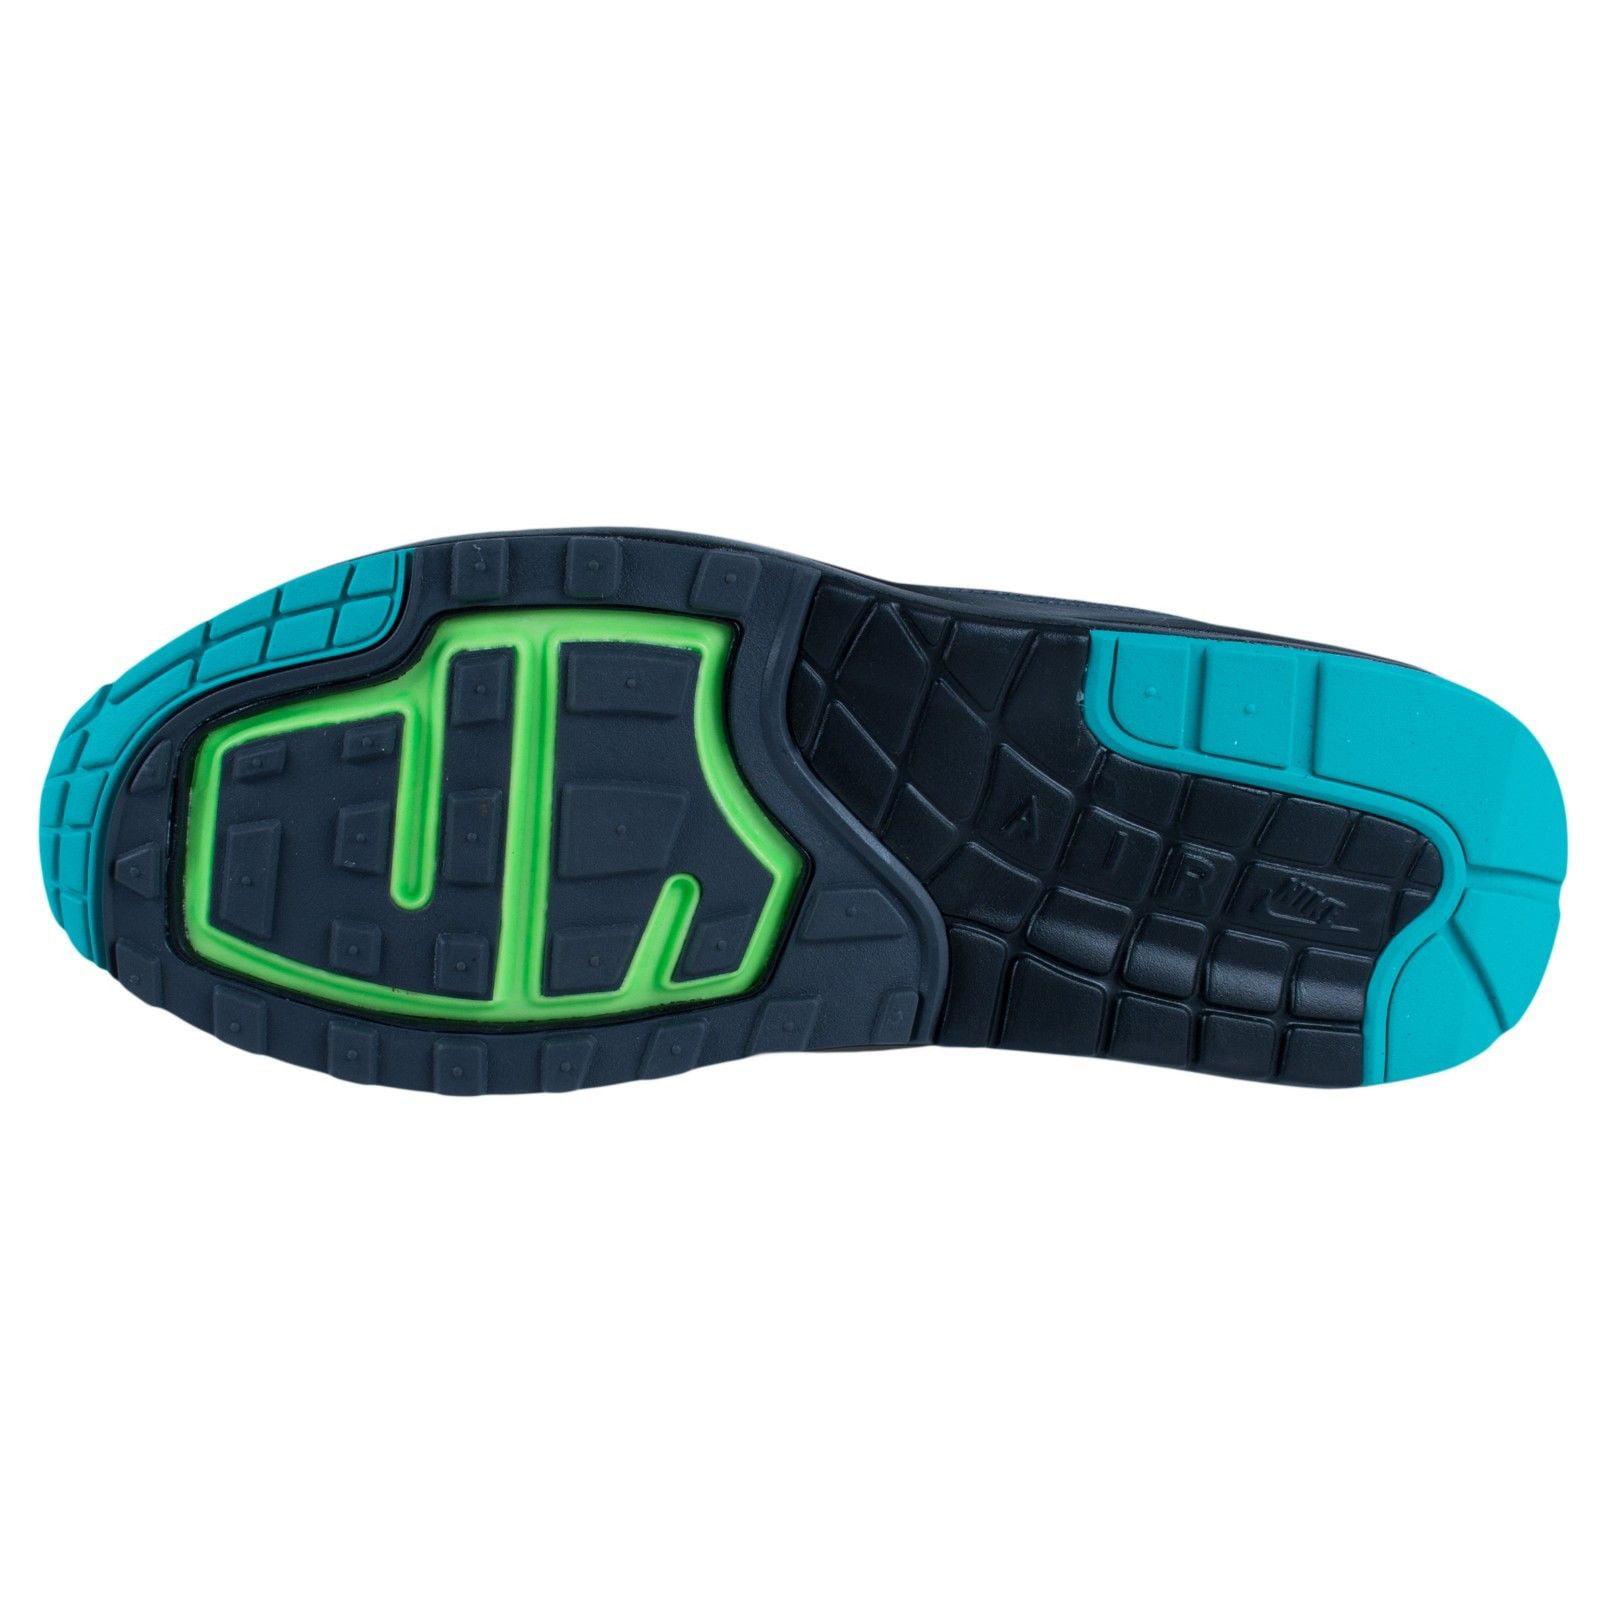 82ca455be4a0 Nike - NIKE AIR MAX LUNAR1 JCRD WINTER BLACK FLASH LIME HYPER COBALT 684494  003 - Walmart.com